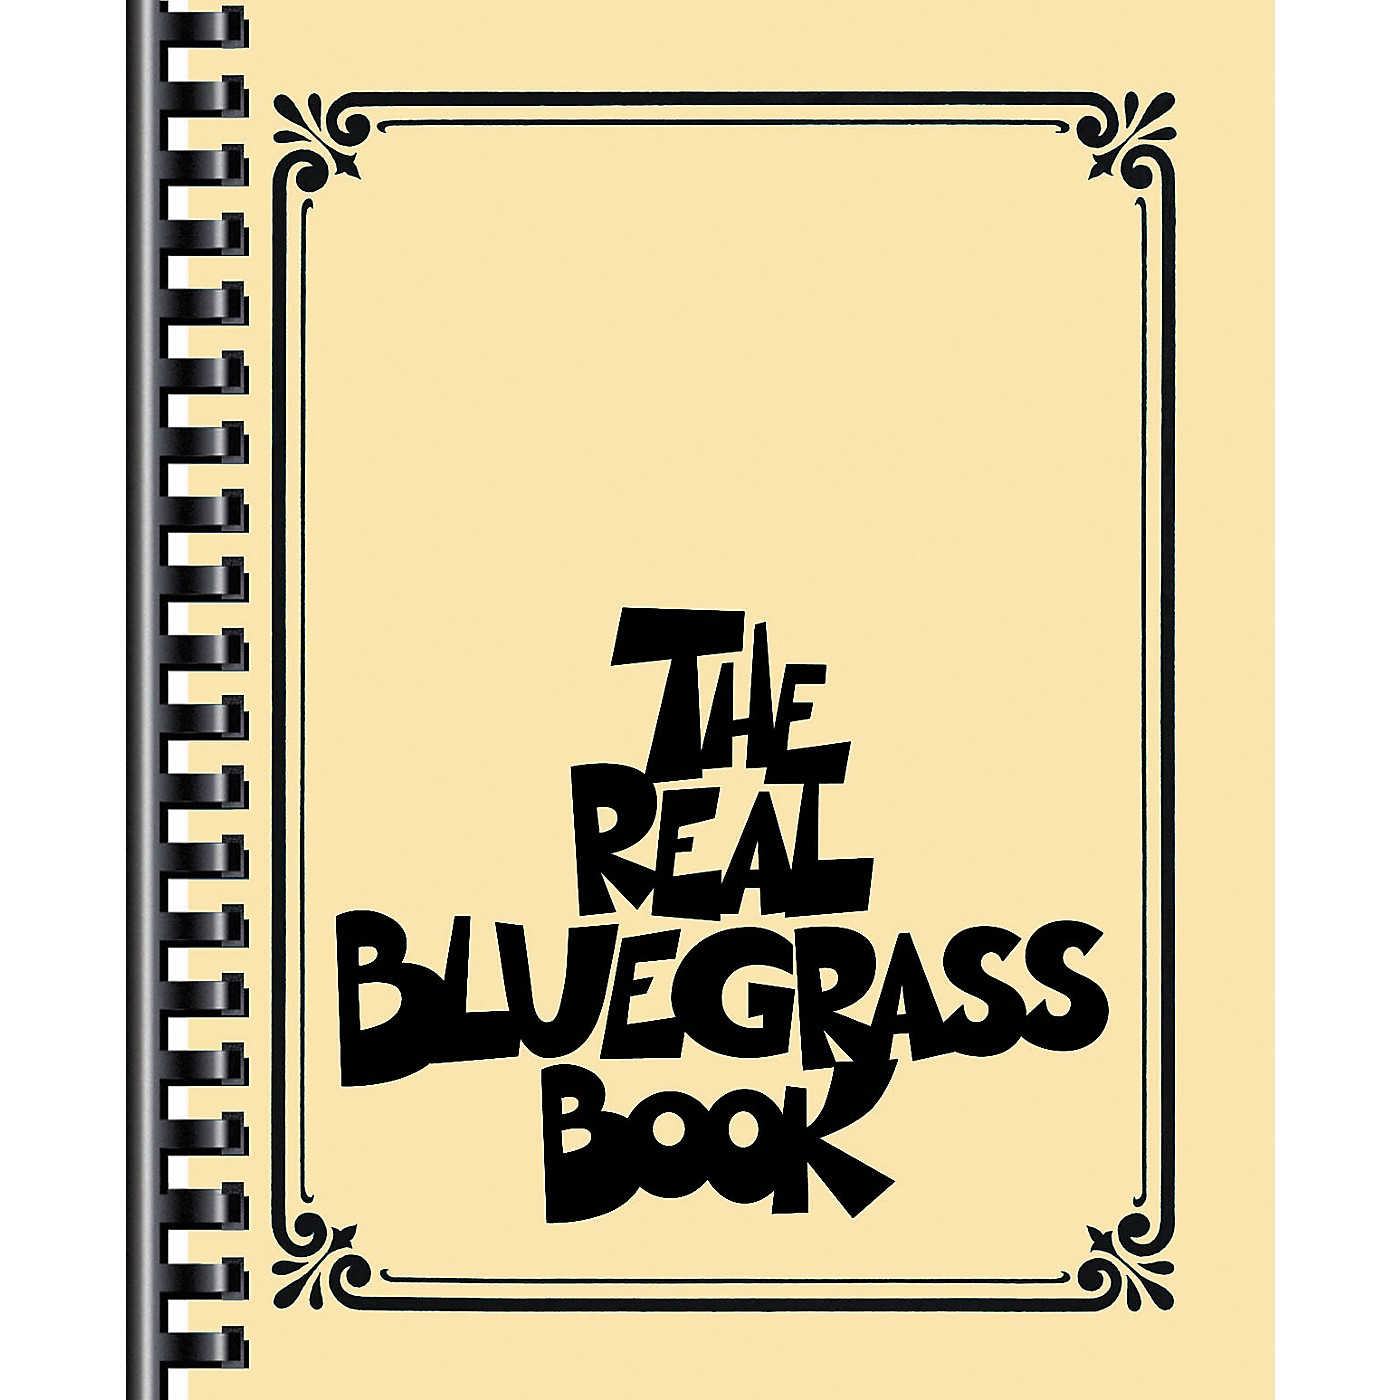 Hal Leonard The Real Bluegrass Book - Fake Book thumbnail